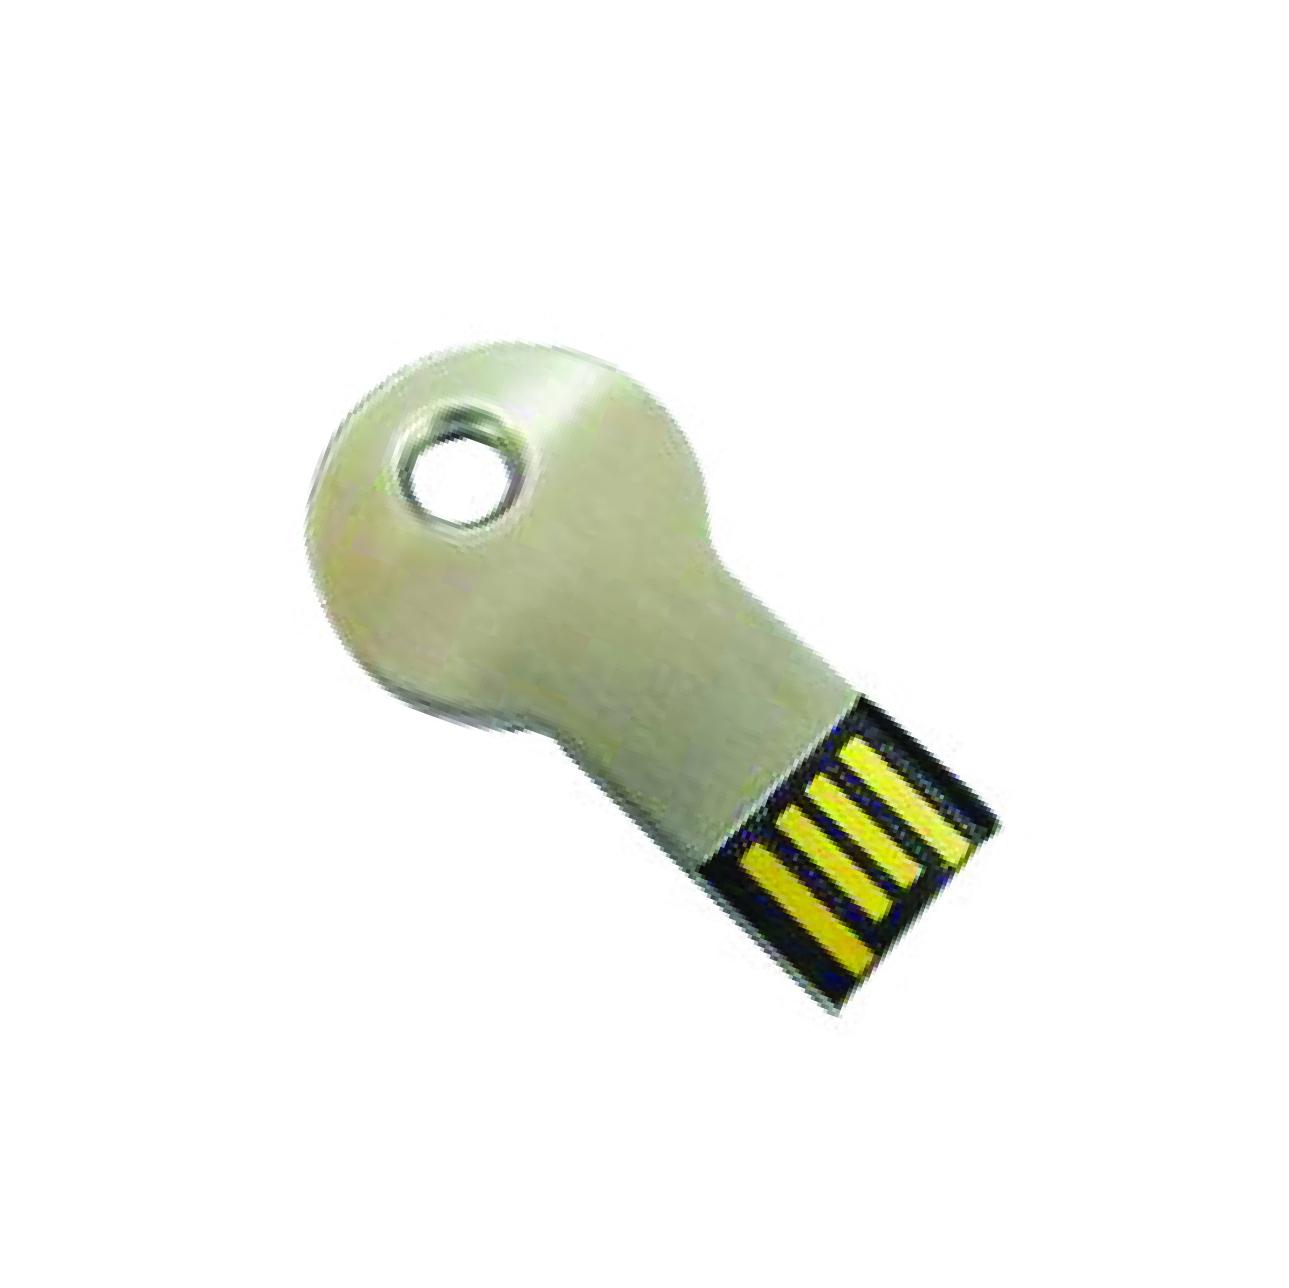 usb-флешка мини ключ оптом